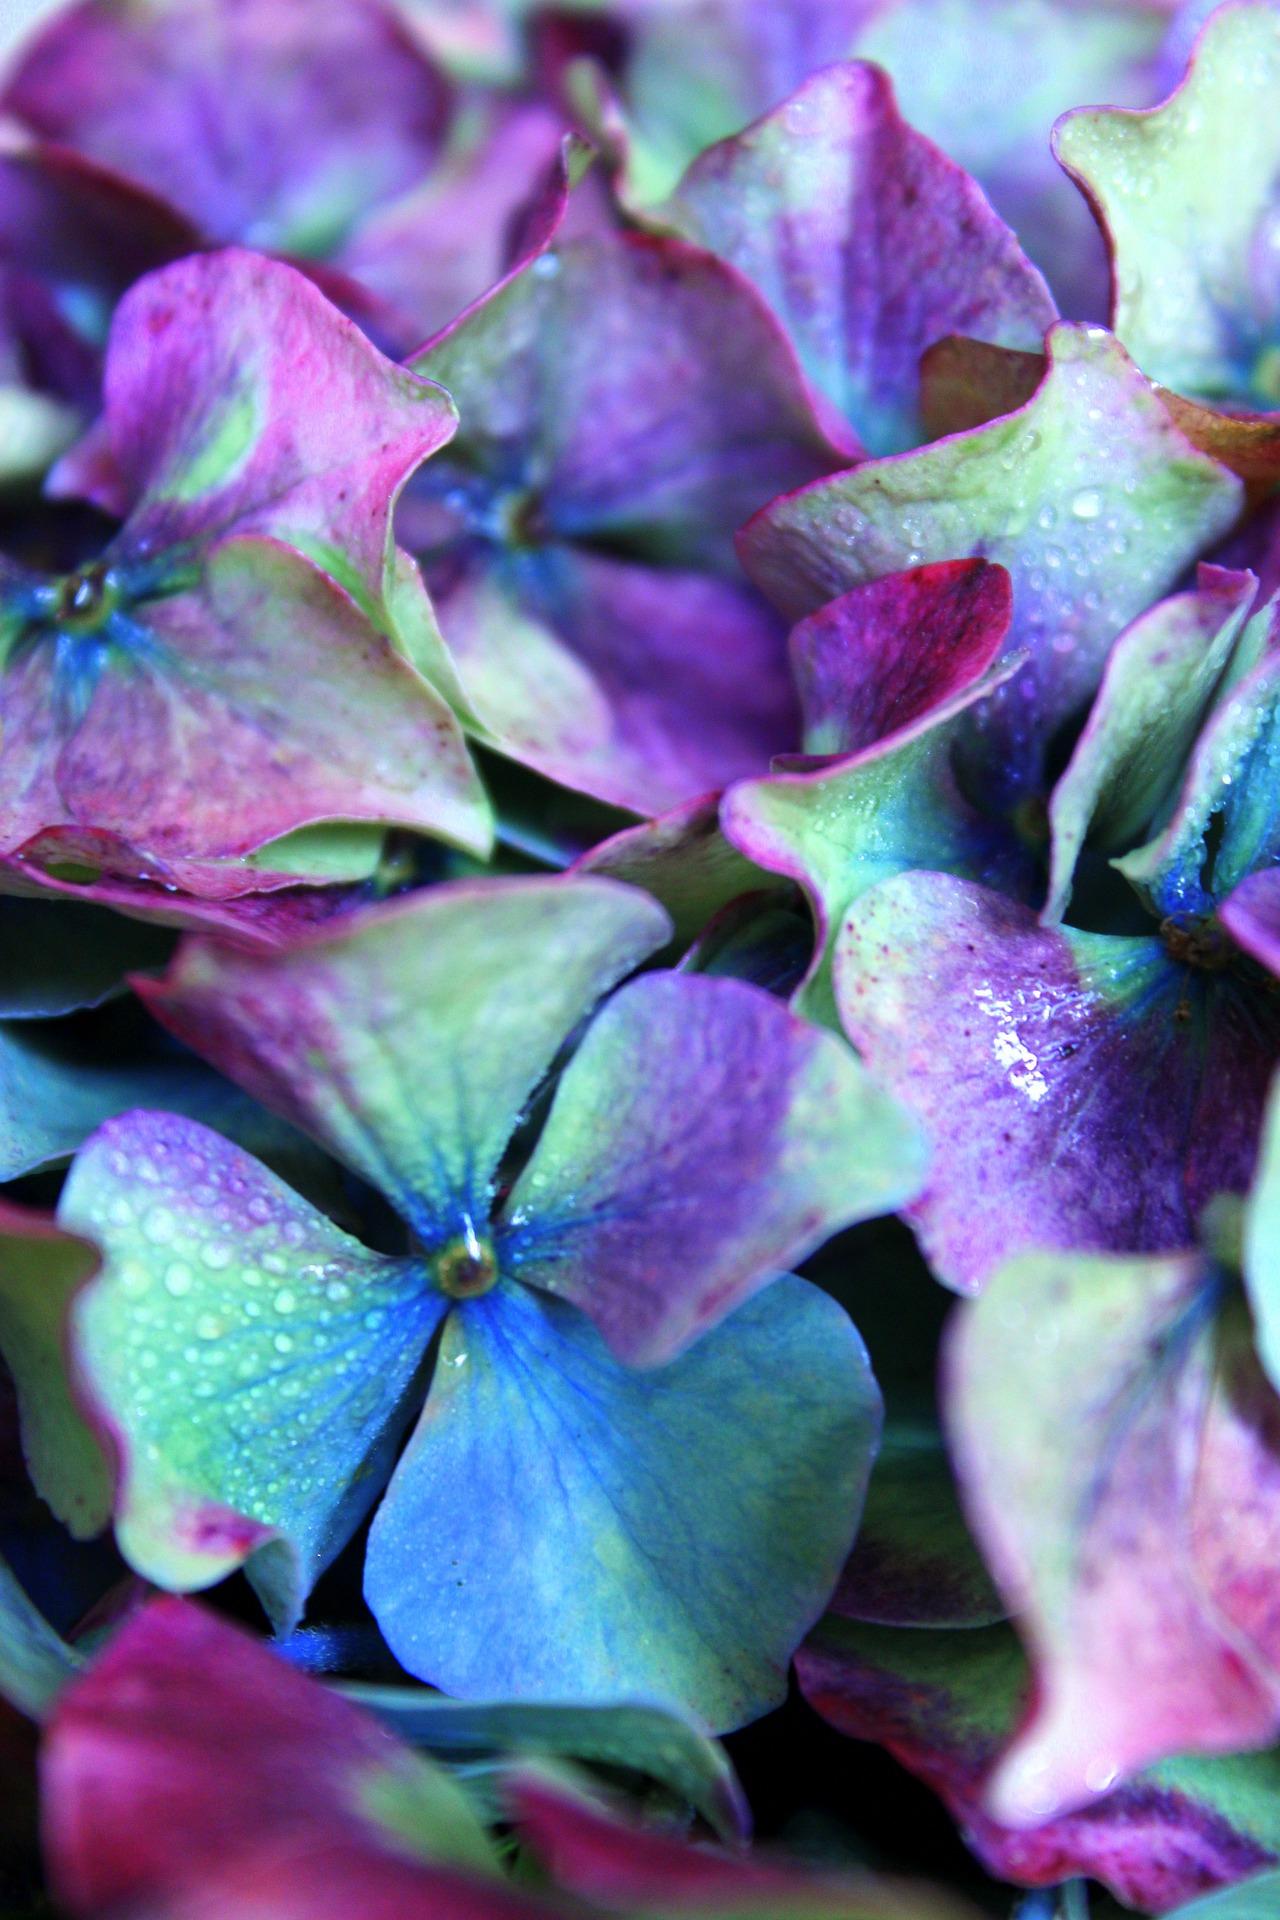 hydrangea-seasonal-london-spring-flowers